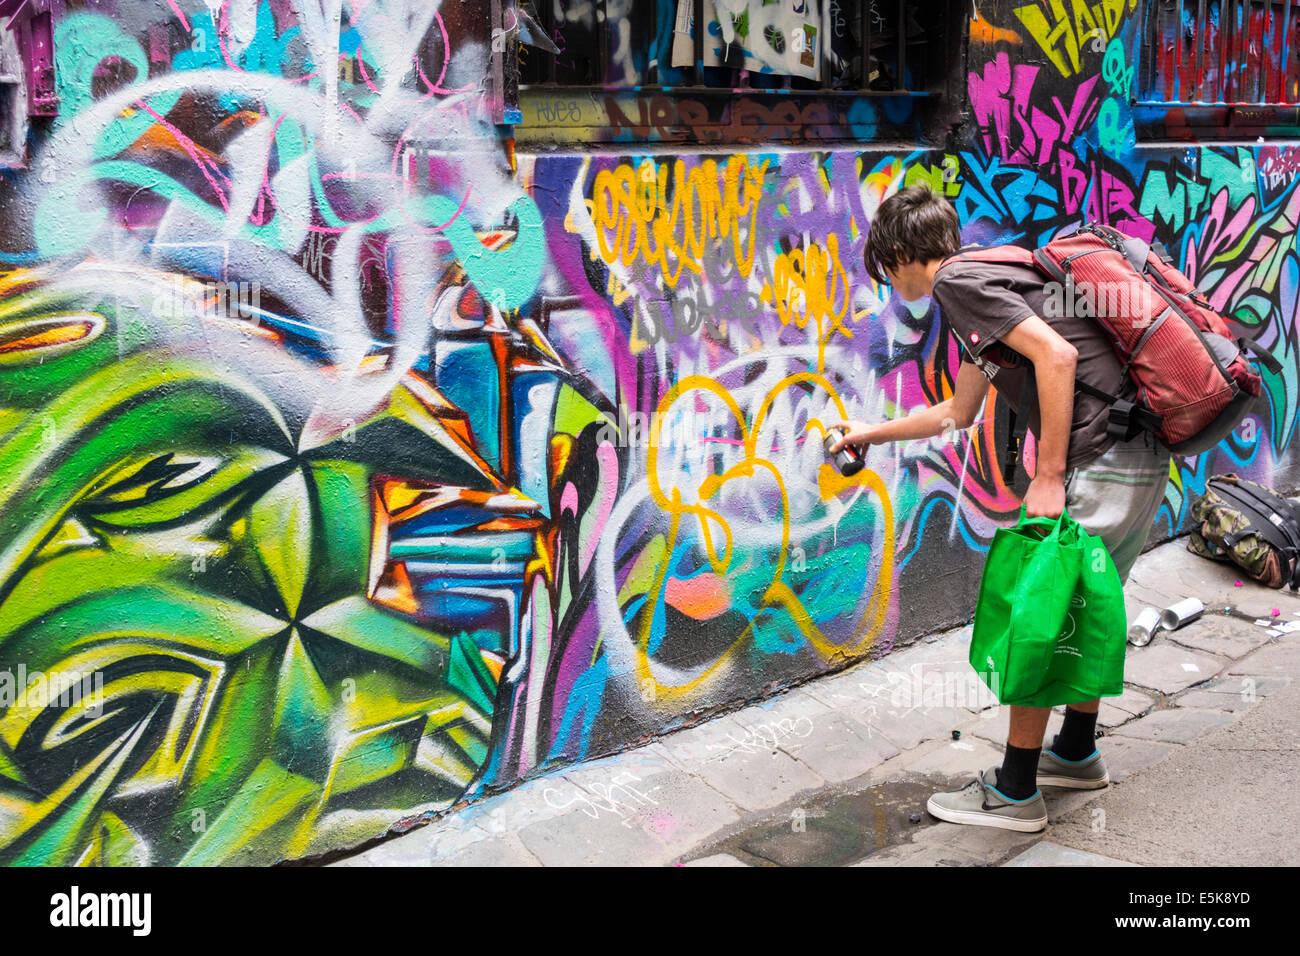 Melbourne Australien Victoria Central Business District CBD Hosier Lane urban street-Art Wandbilder Graffiti teenboy Stockbild